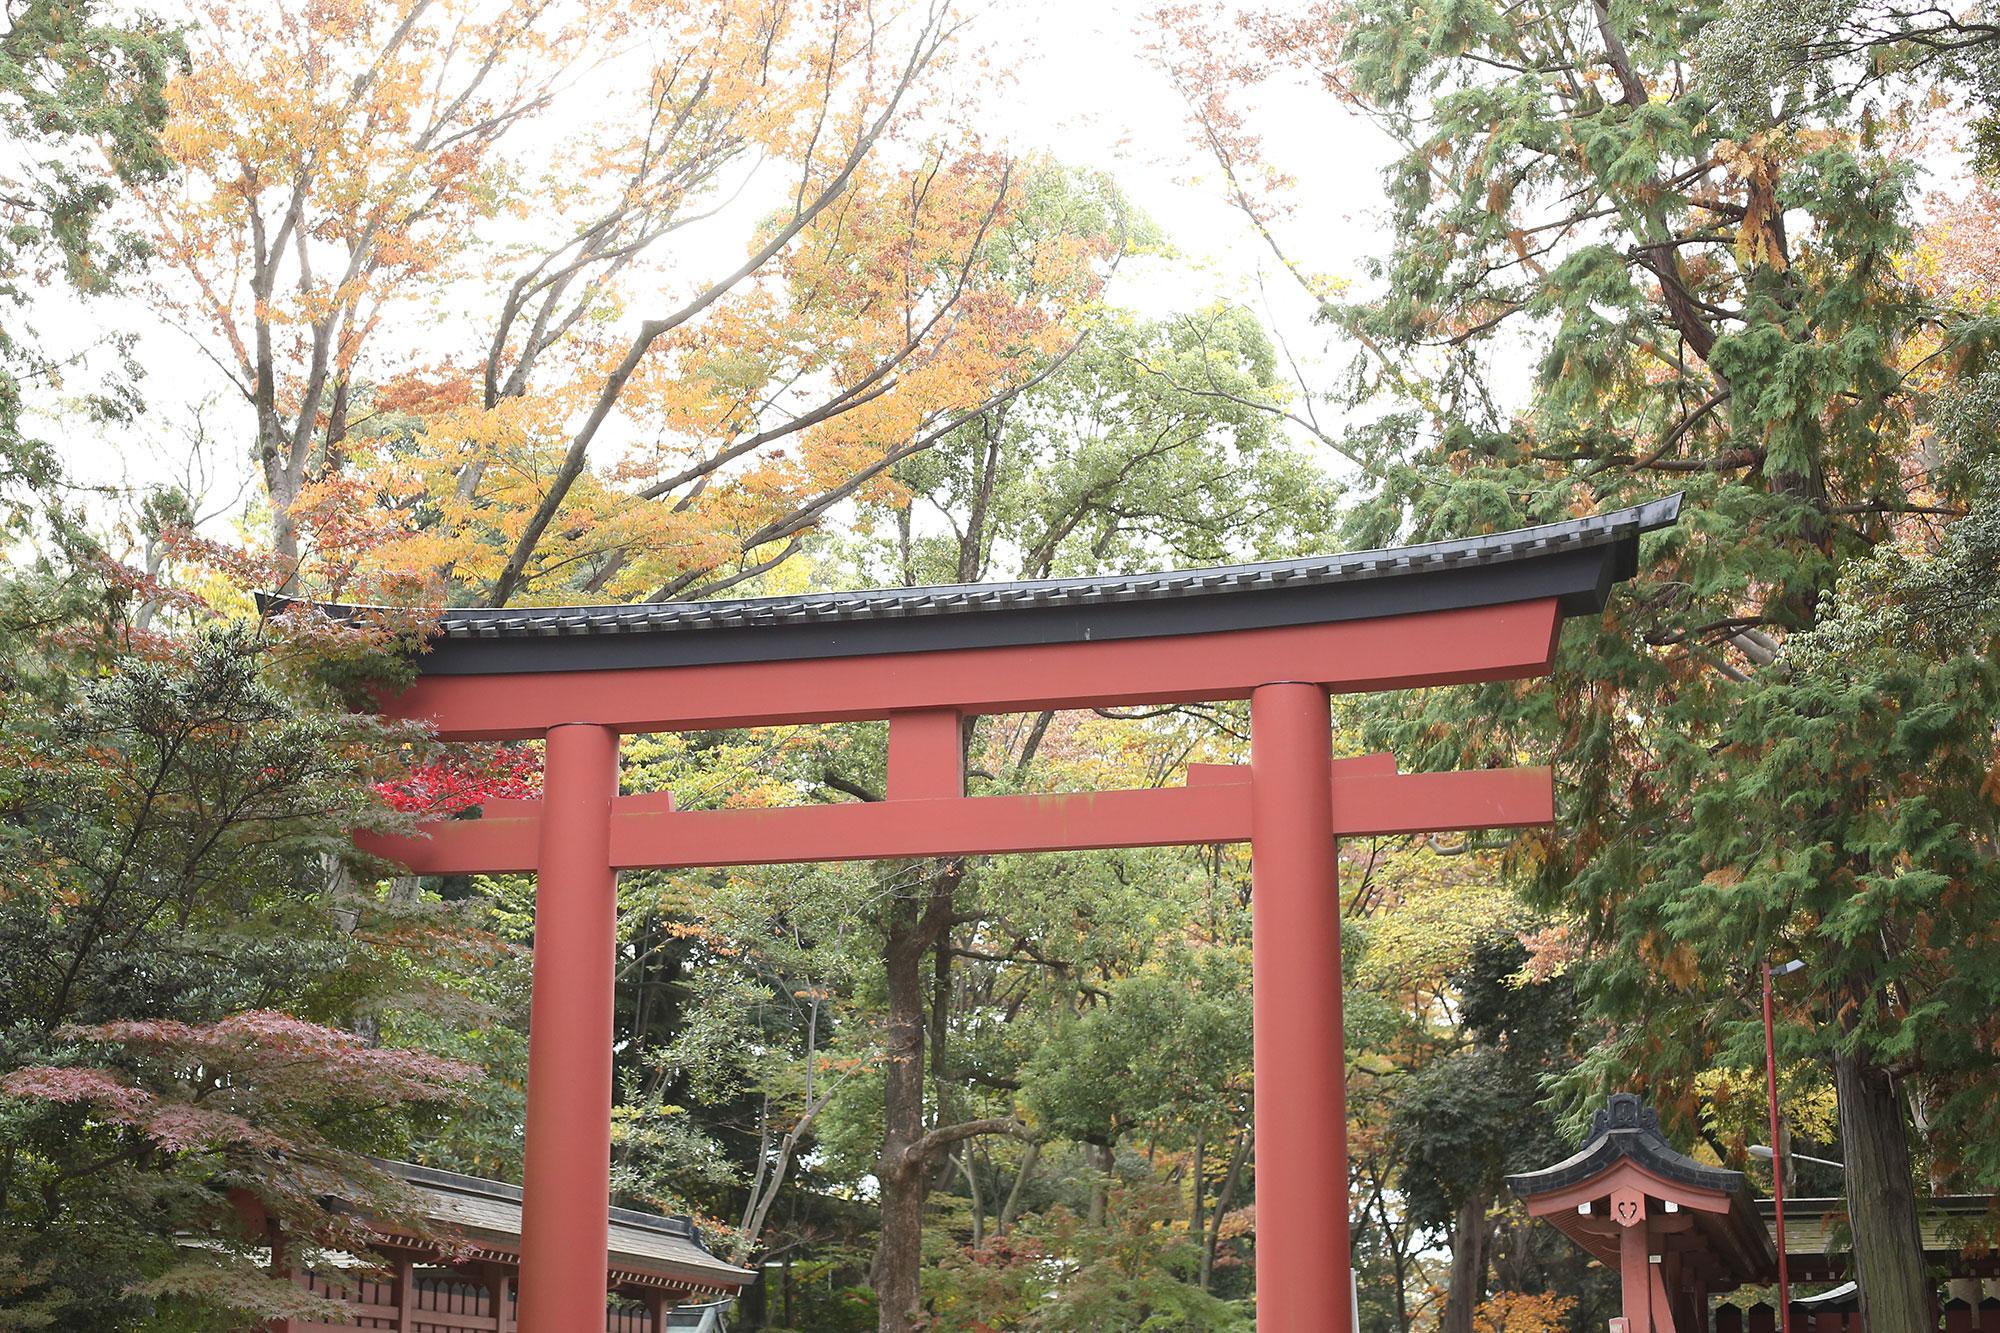 大宮氷川神社の大鳥居